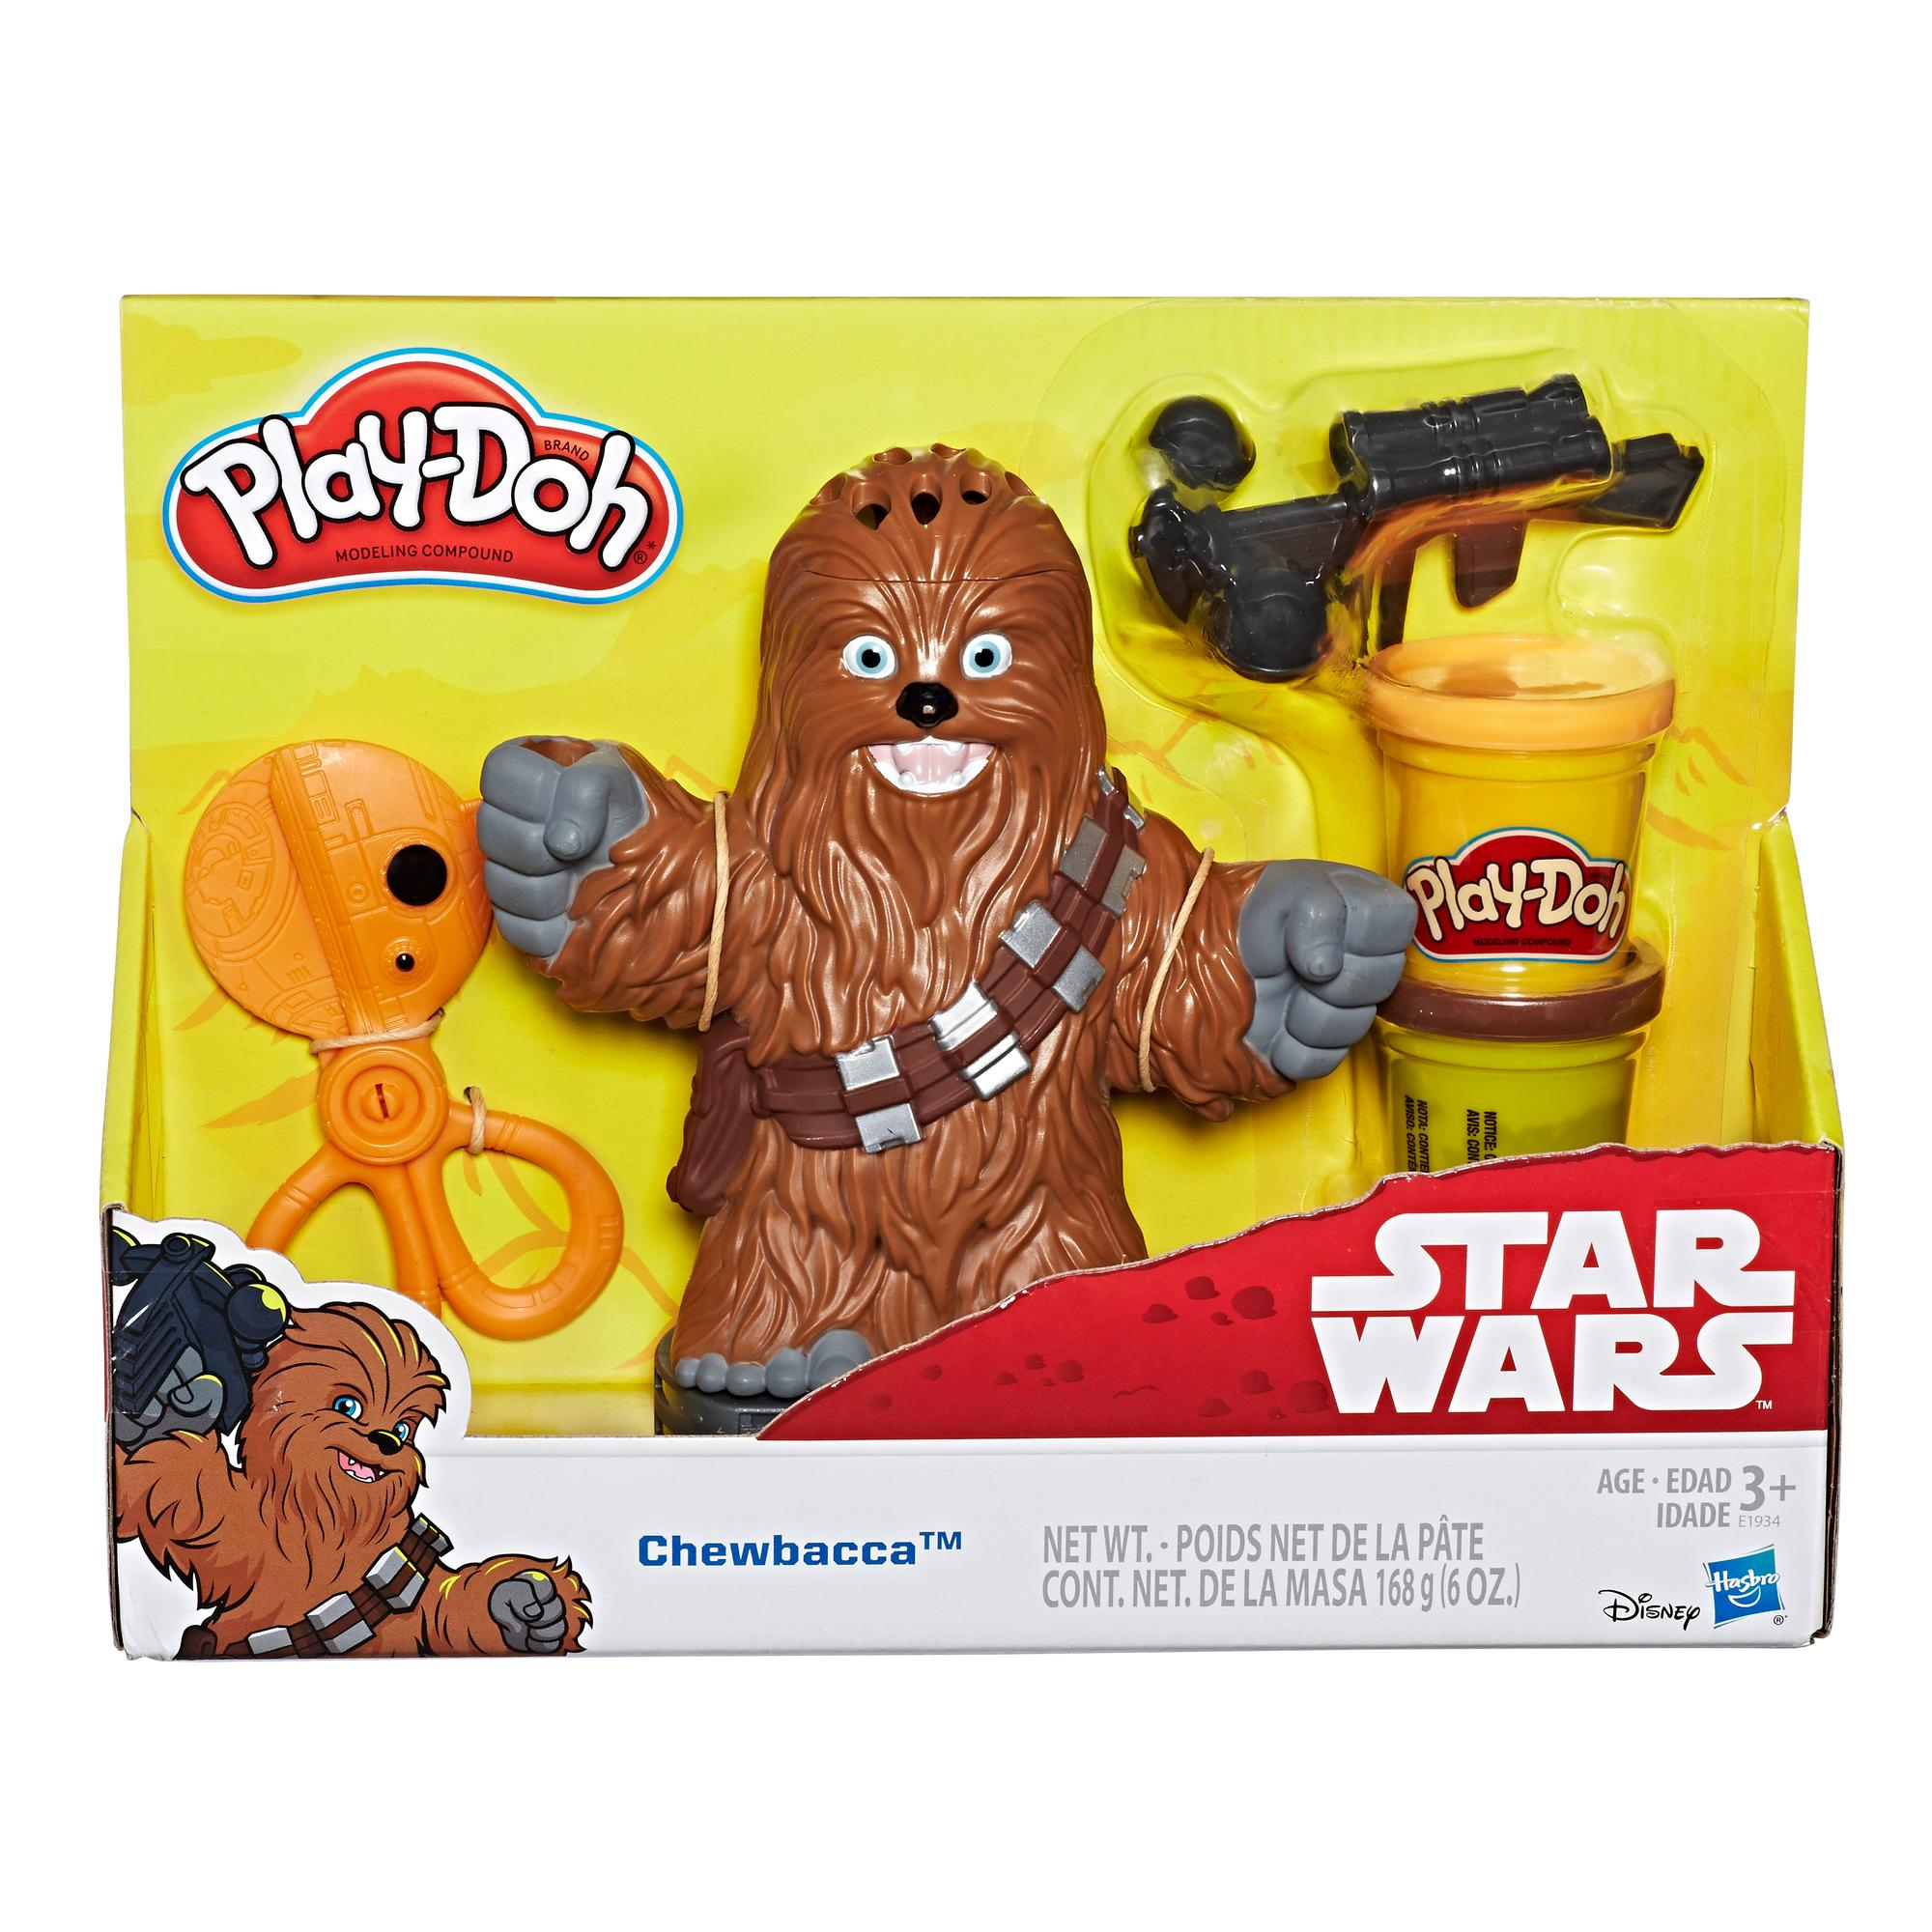 Play-Doh Star Wars Chewbacca